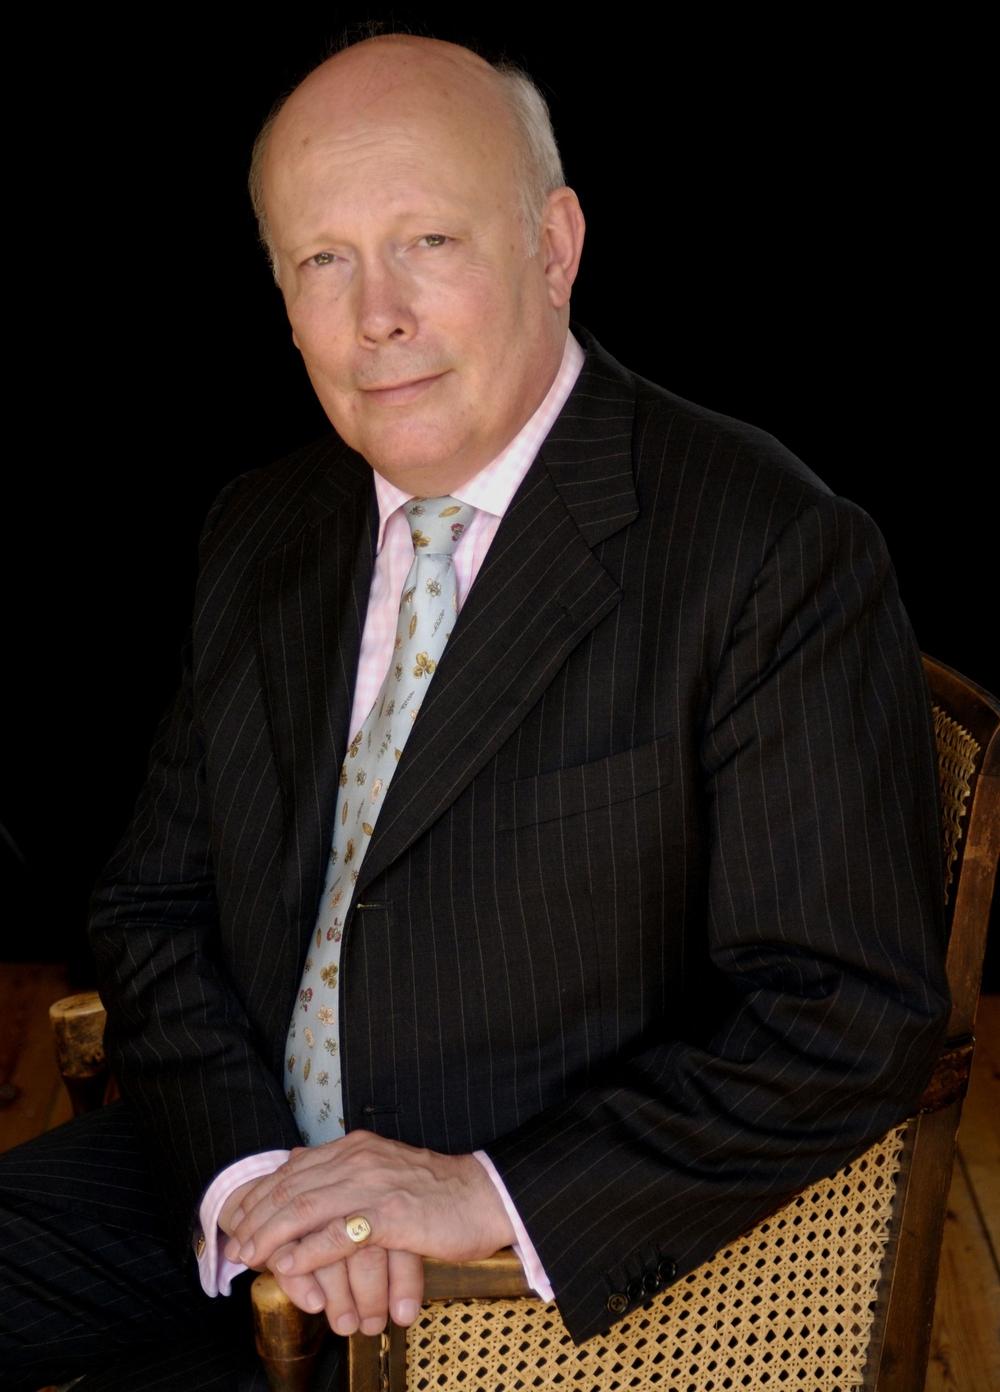 Julian Fellowes - writer